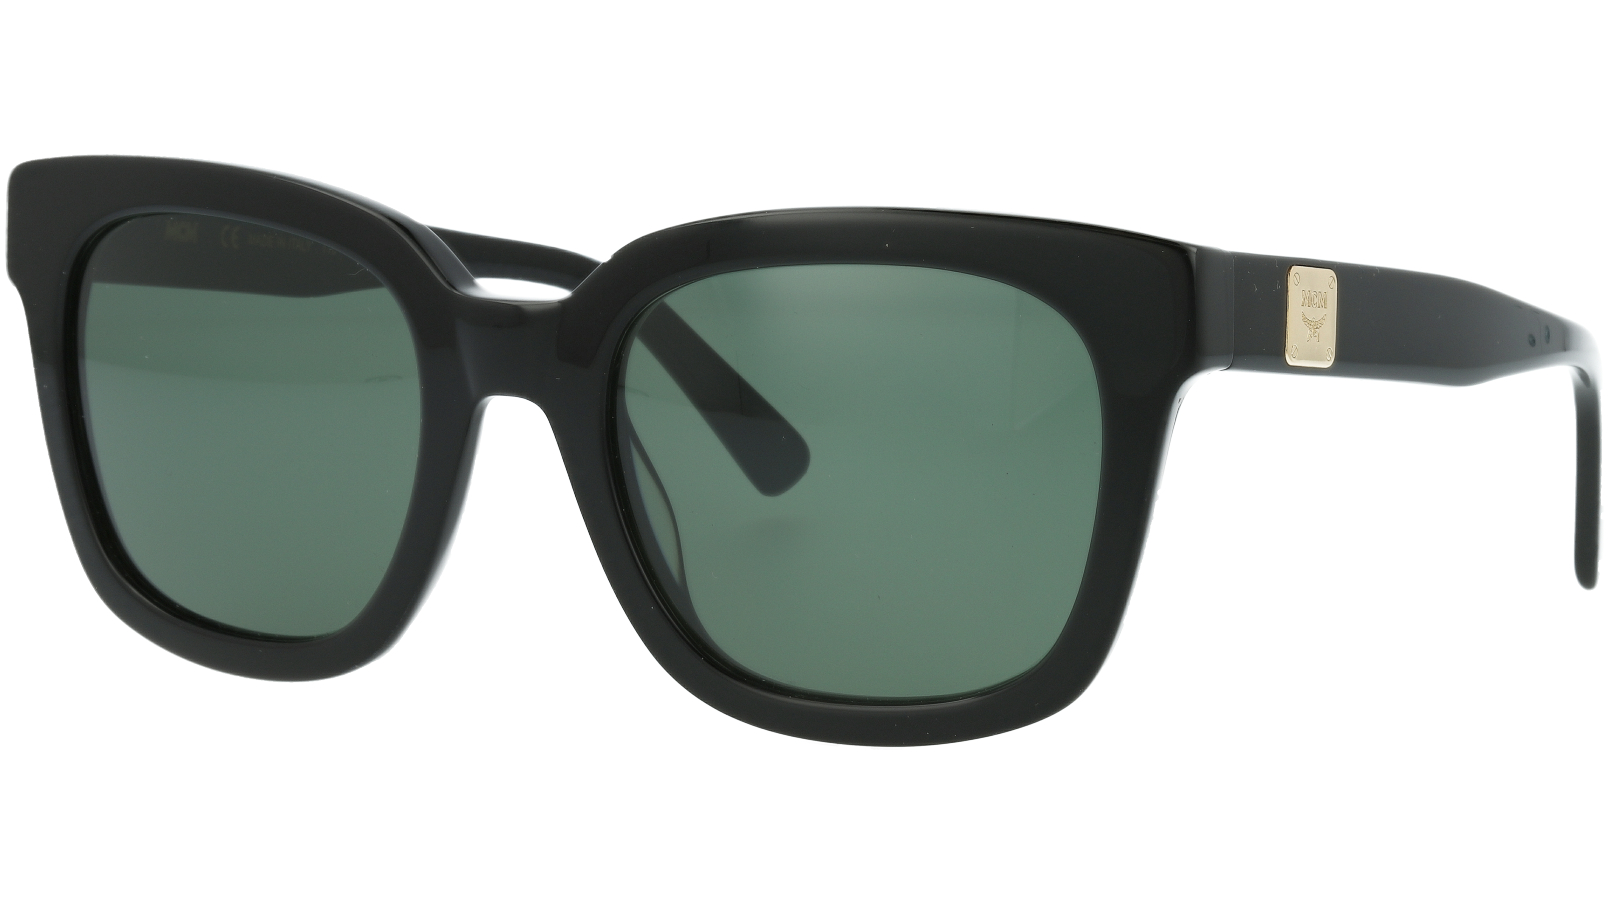 MCM MCM610S 001 54 SHINY Sunglasses